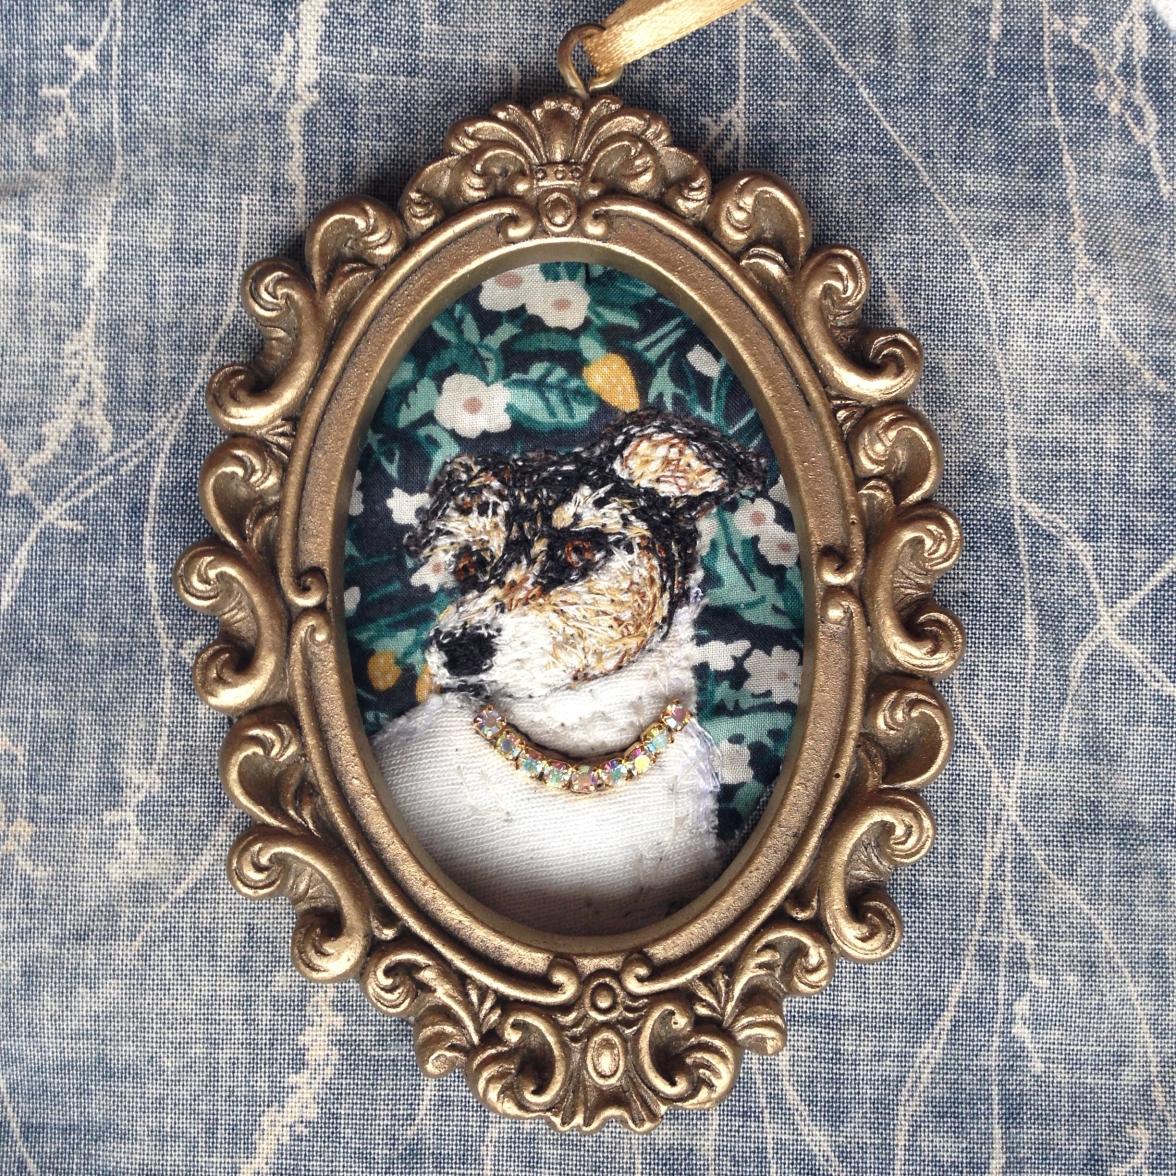 Audrey Versace in locket, a new Elizabethan